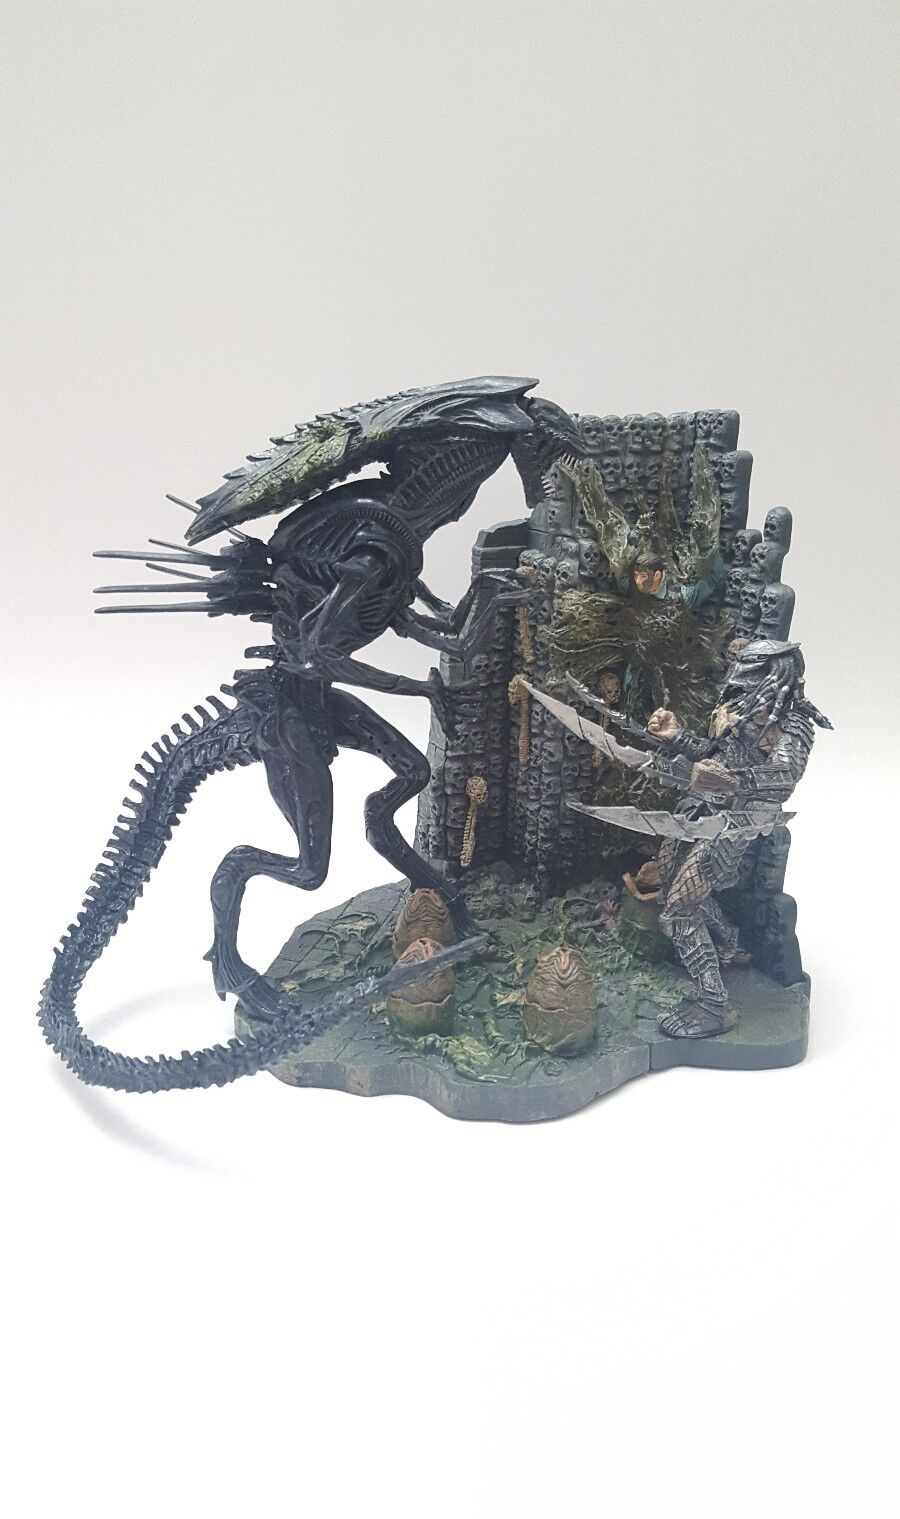 McFarlane Alien vs Prougeator  Playsets Alien Queen vs Prougeator w  Base Diorama Set  livraison gratuite!